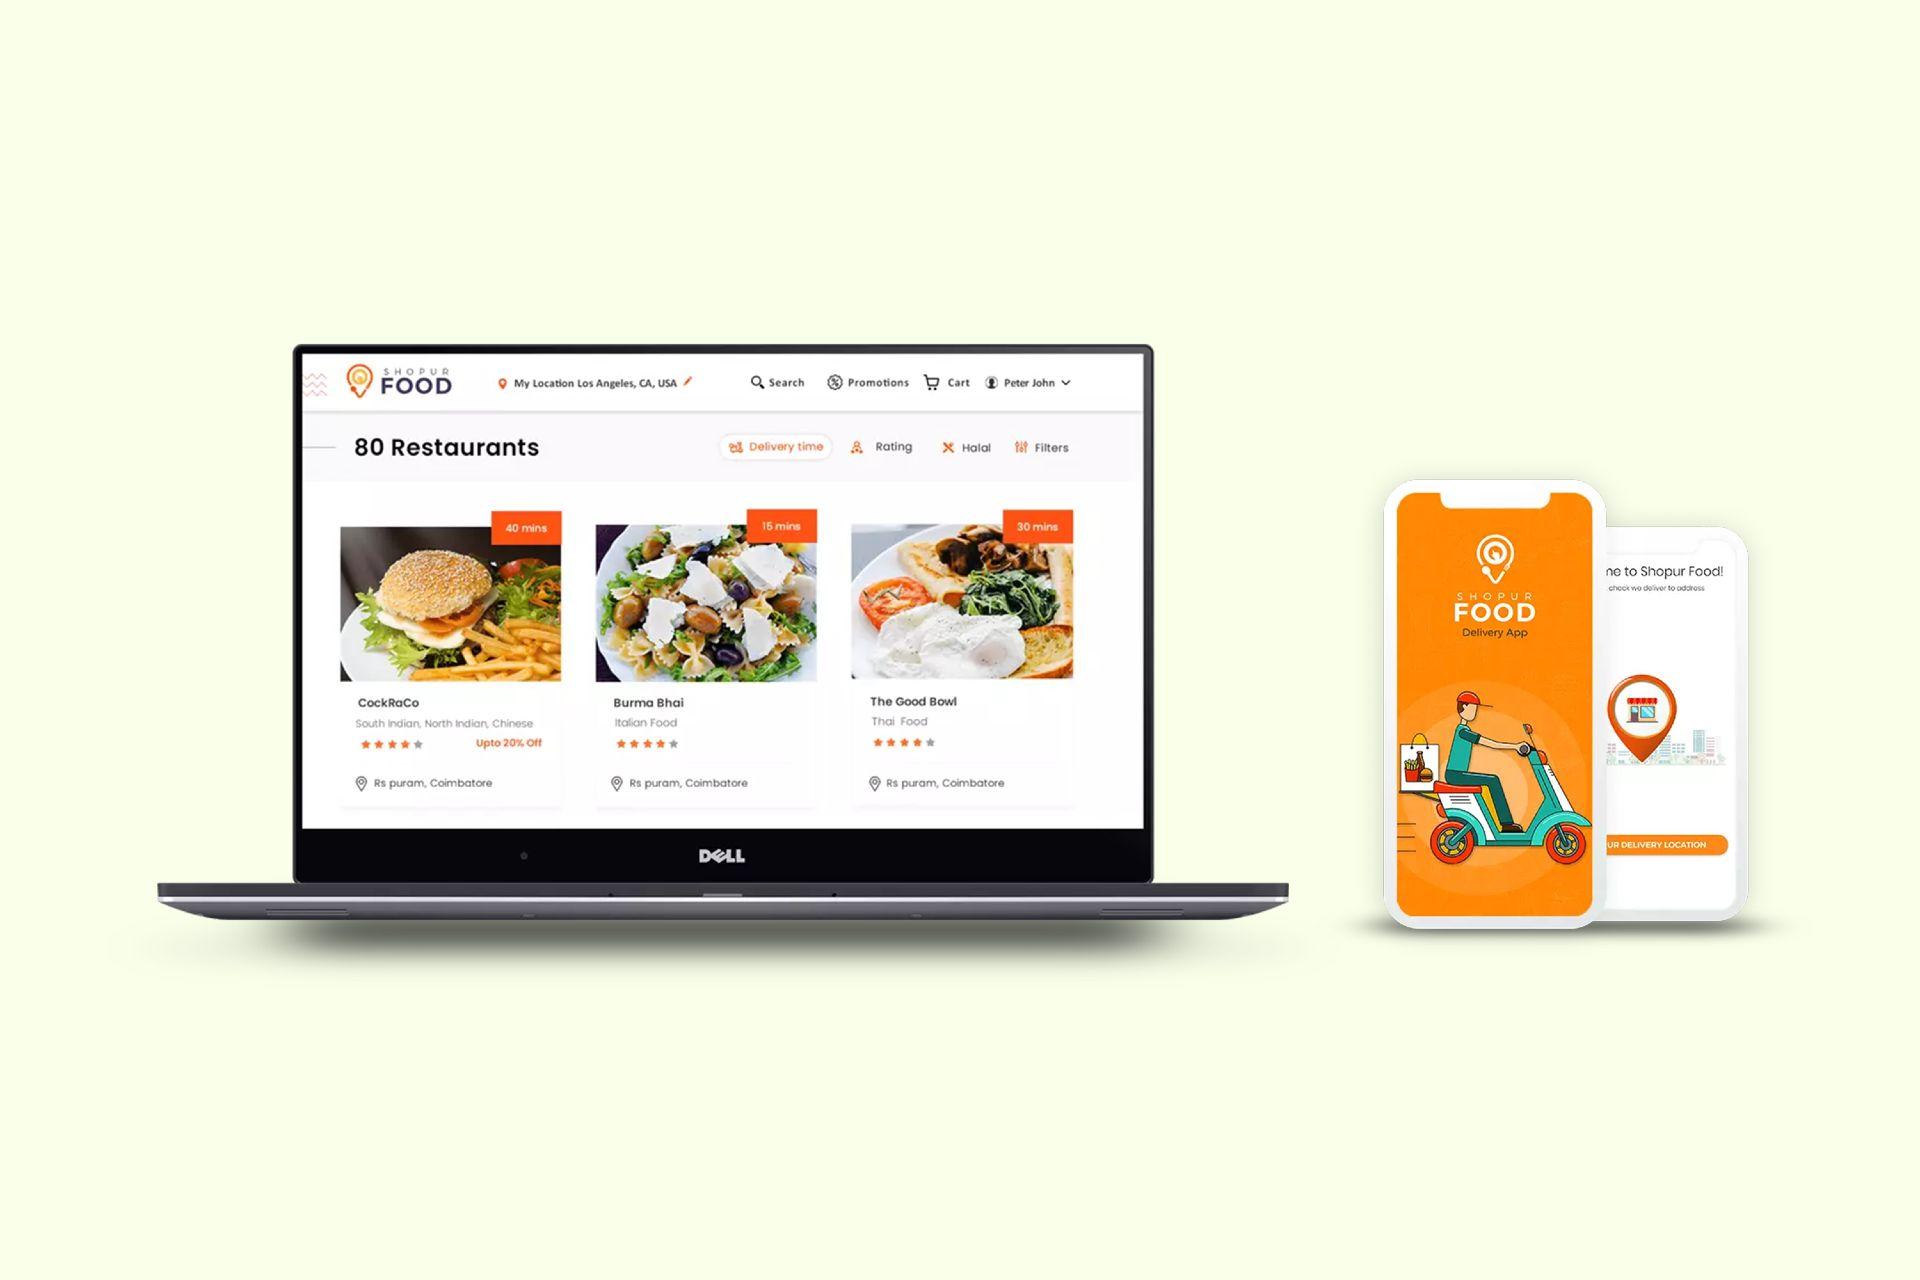 Shopurfood v3.0.1